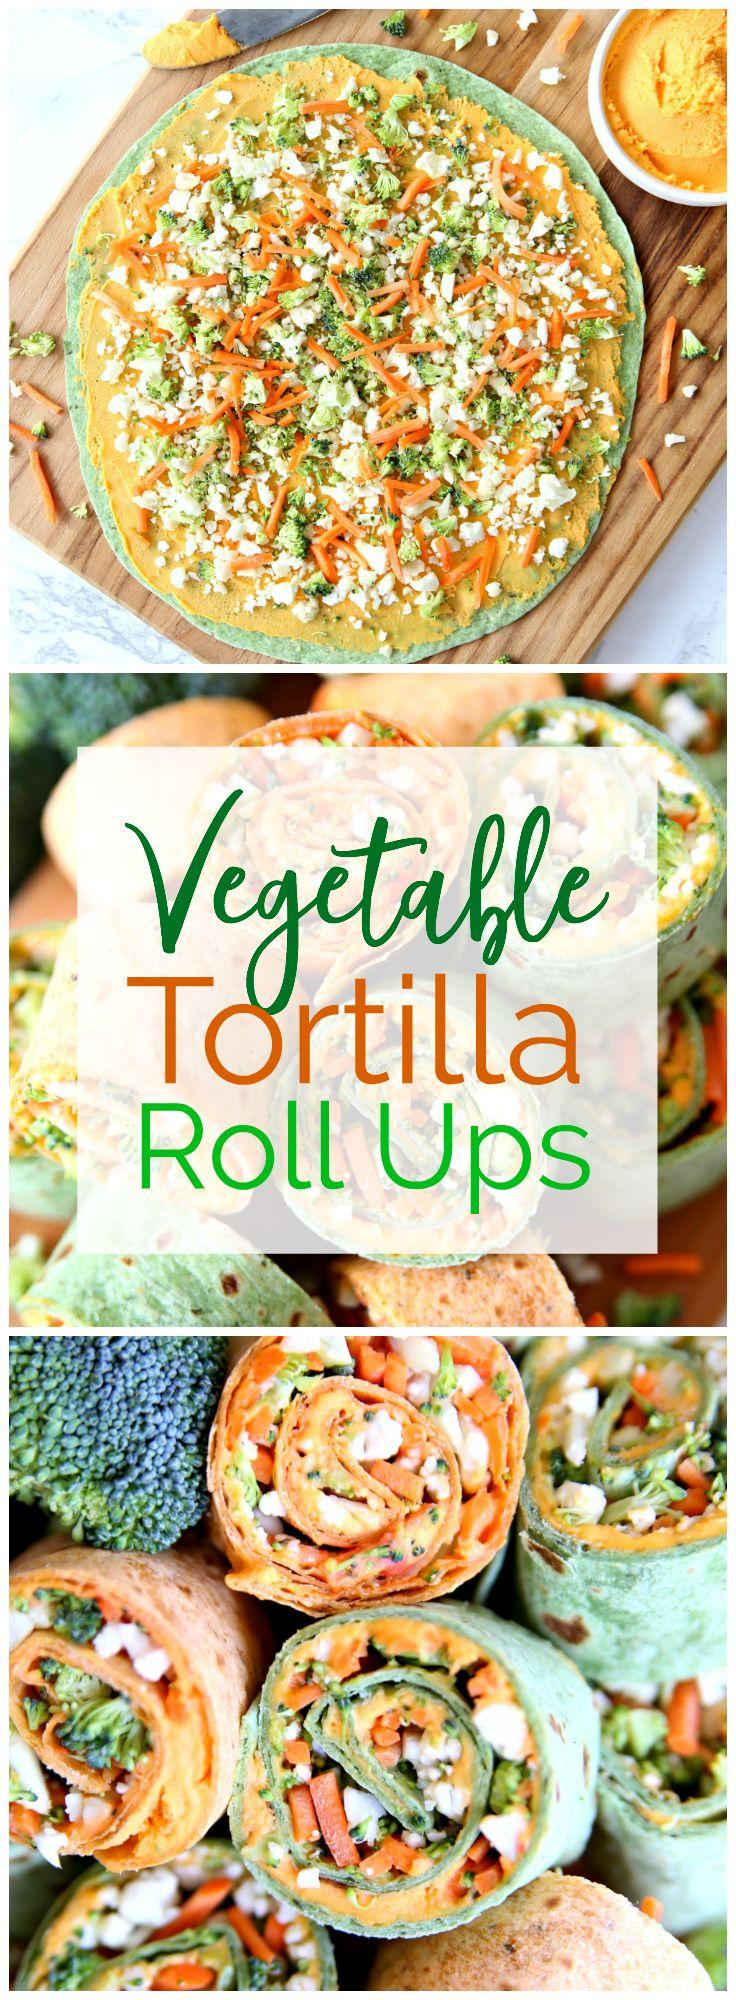 Vegetable Tortilla Roll Ups - Happy-Go-Lucky